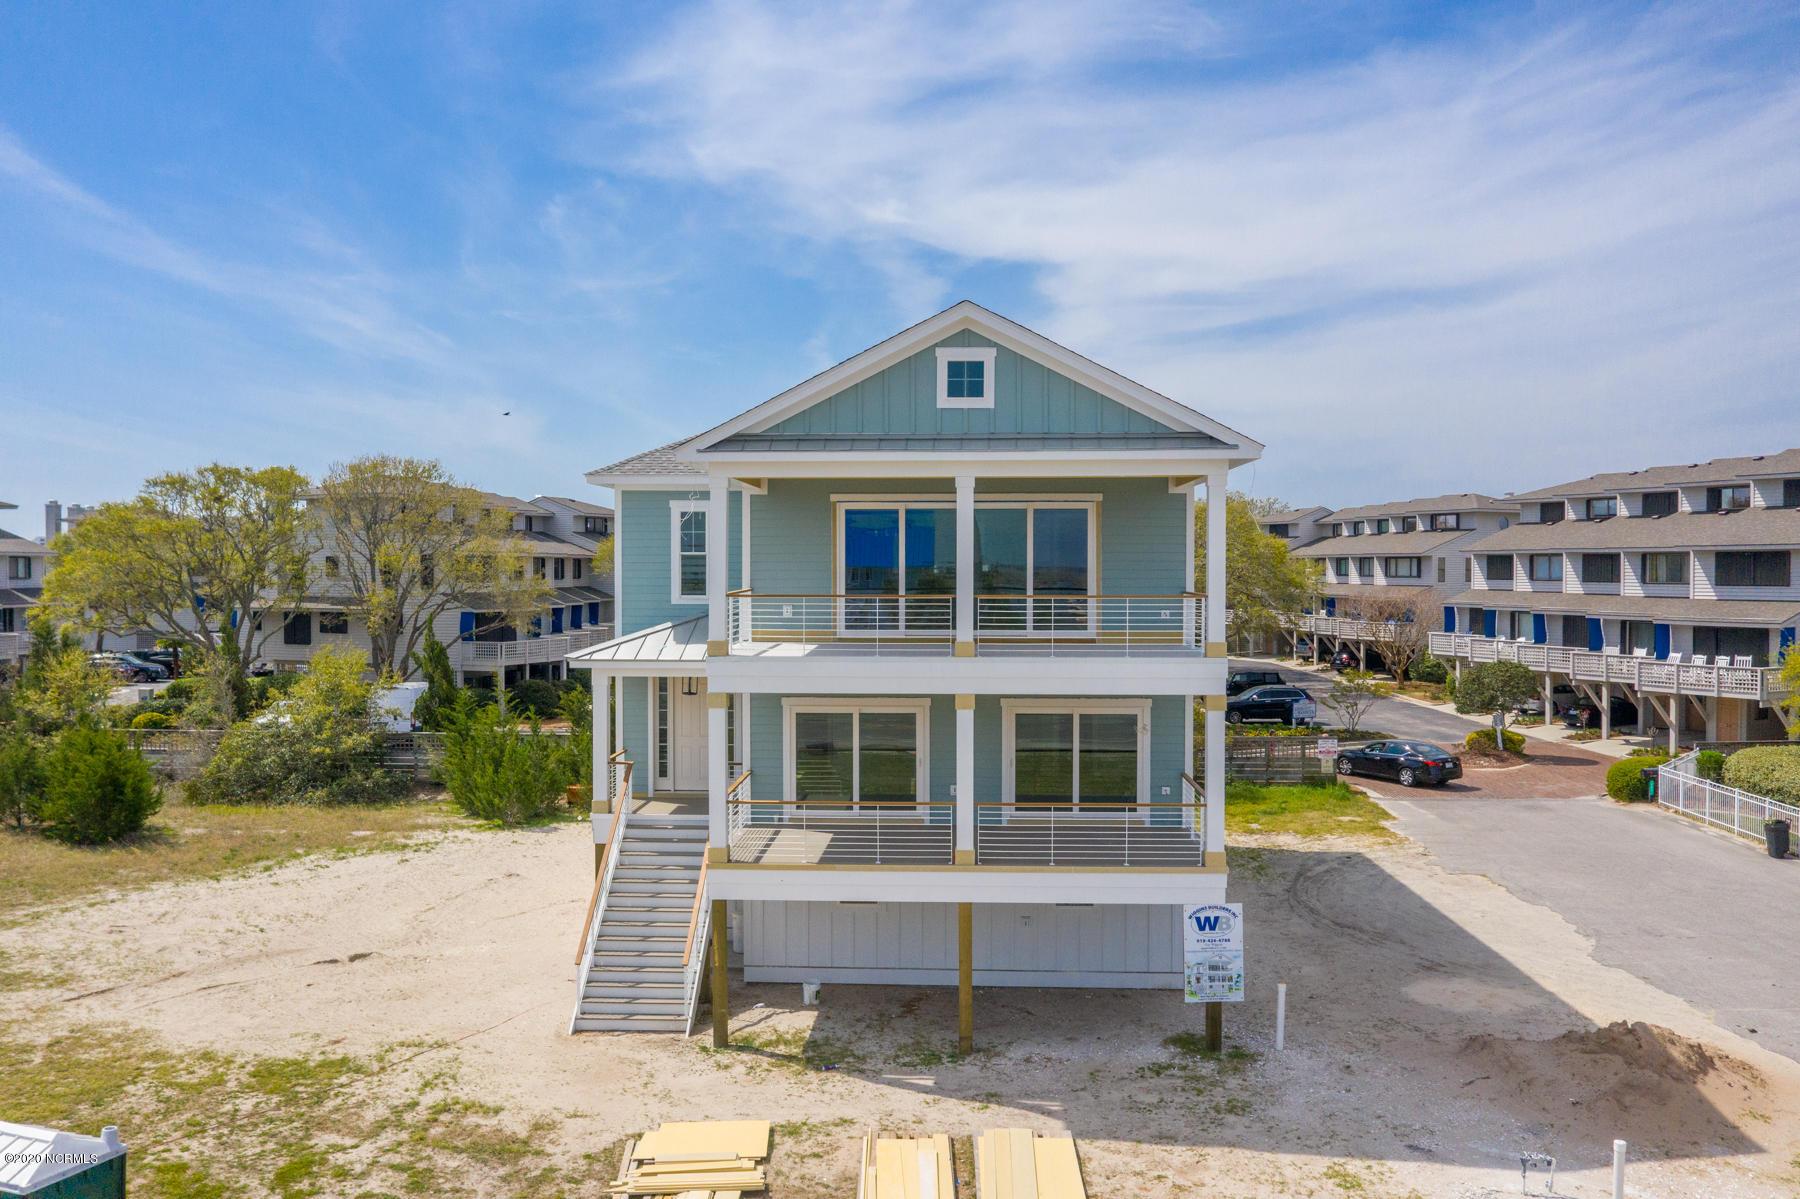 105 W Salisbury Street Wrightsville Beach, NC 28480